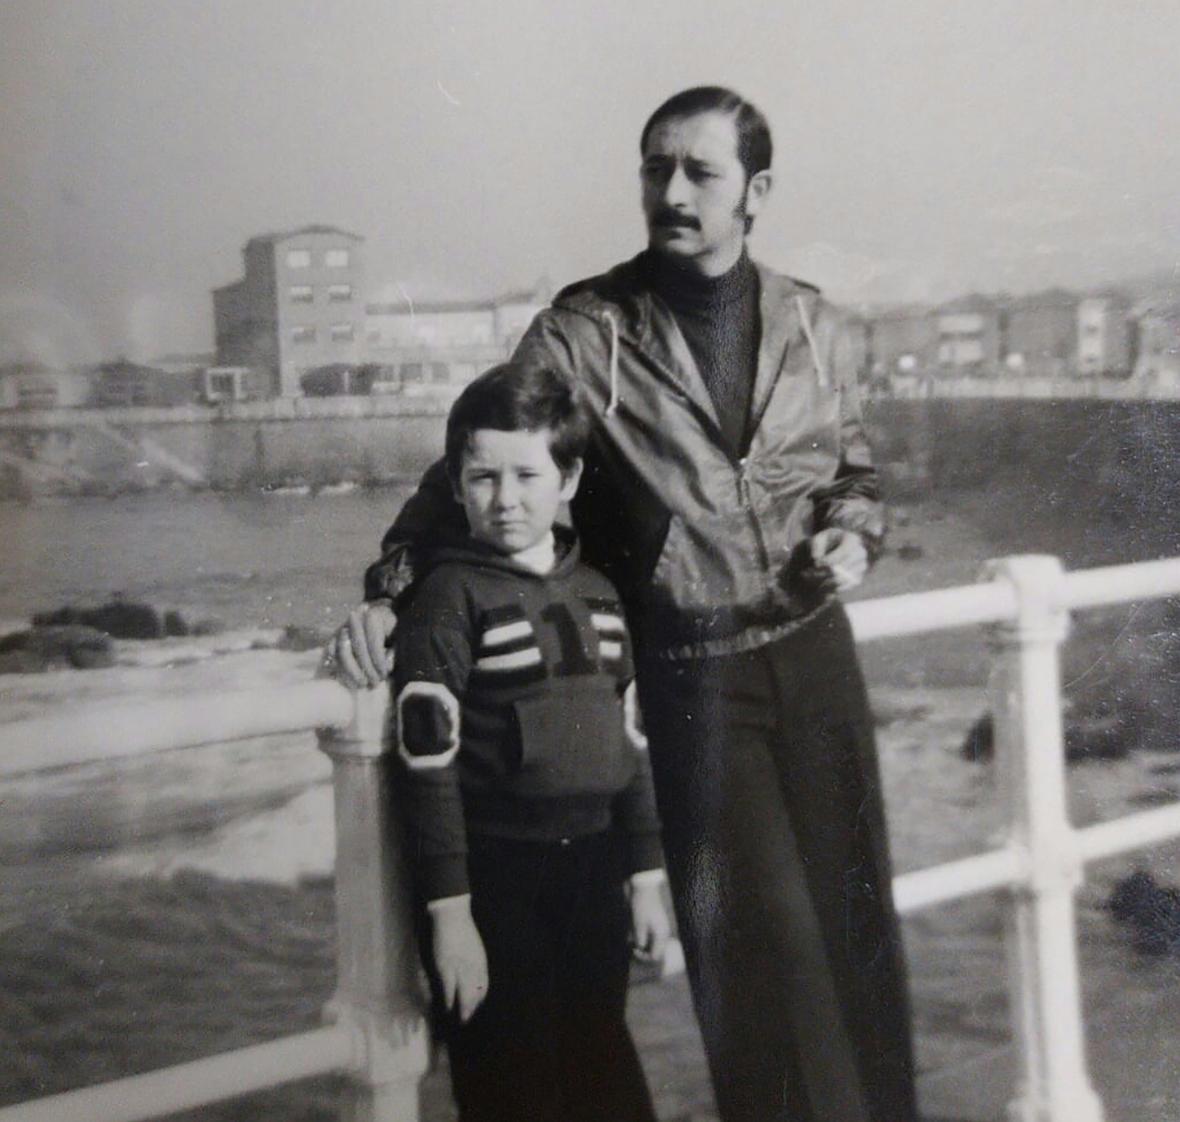 Fotografía del padre e hijo